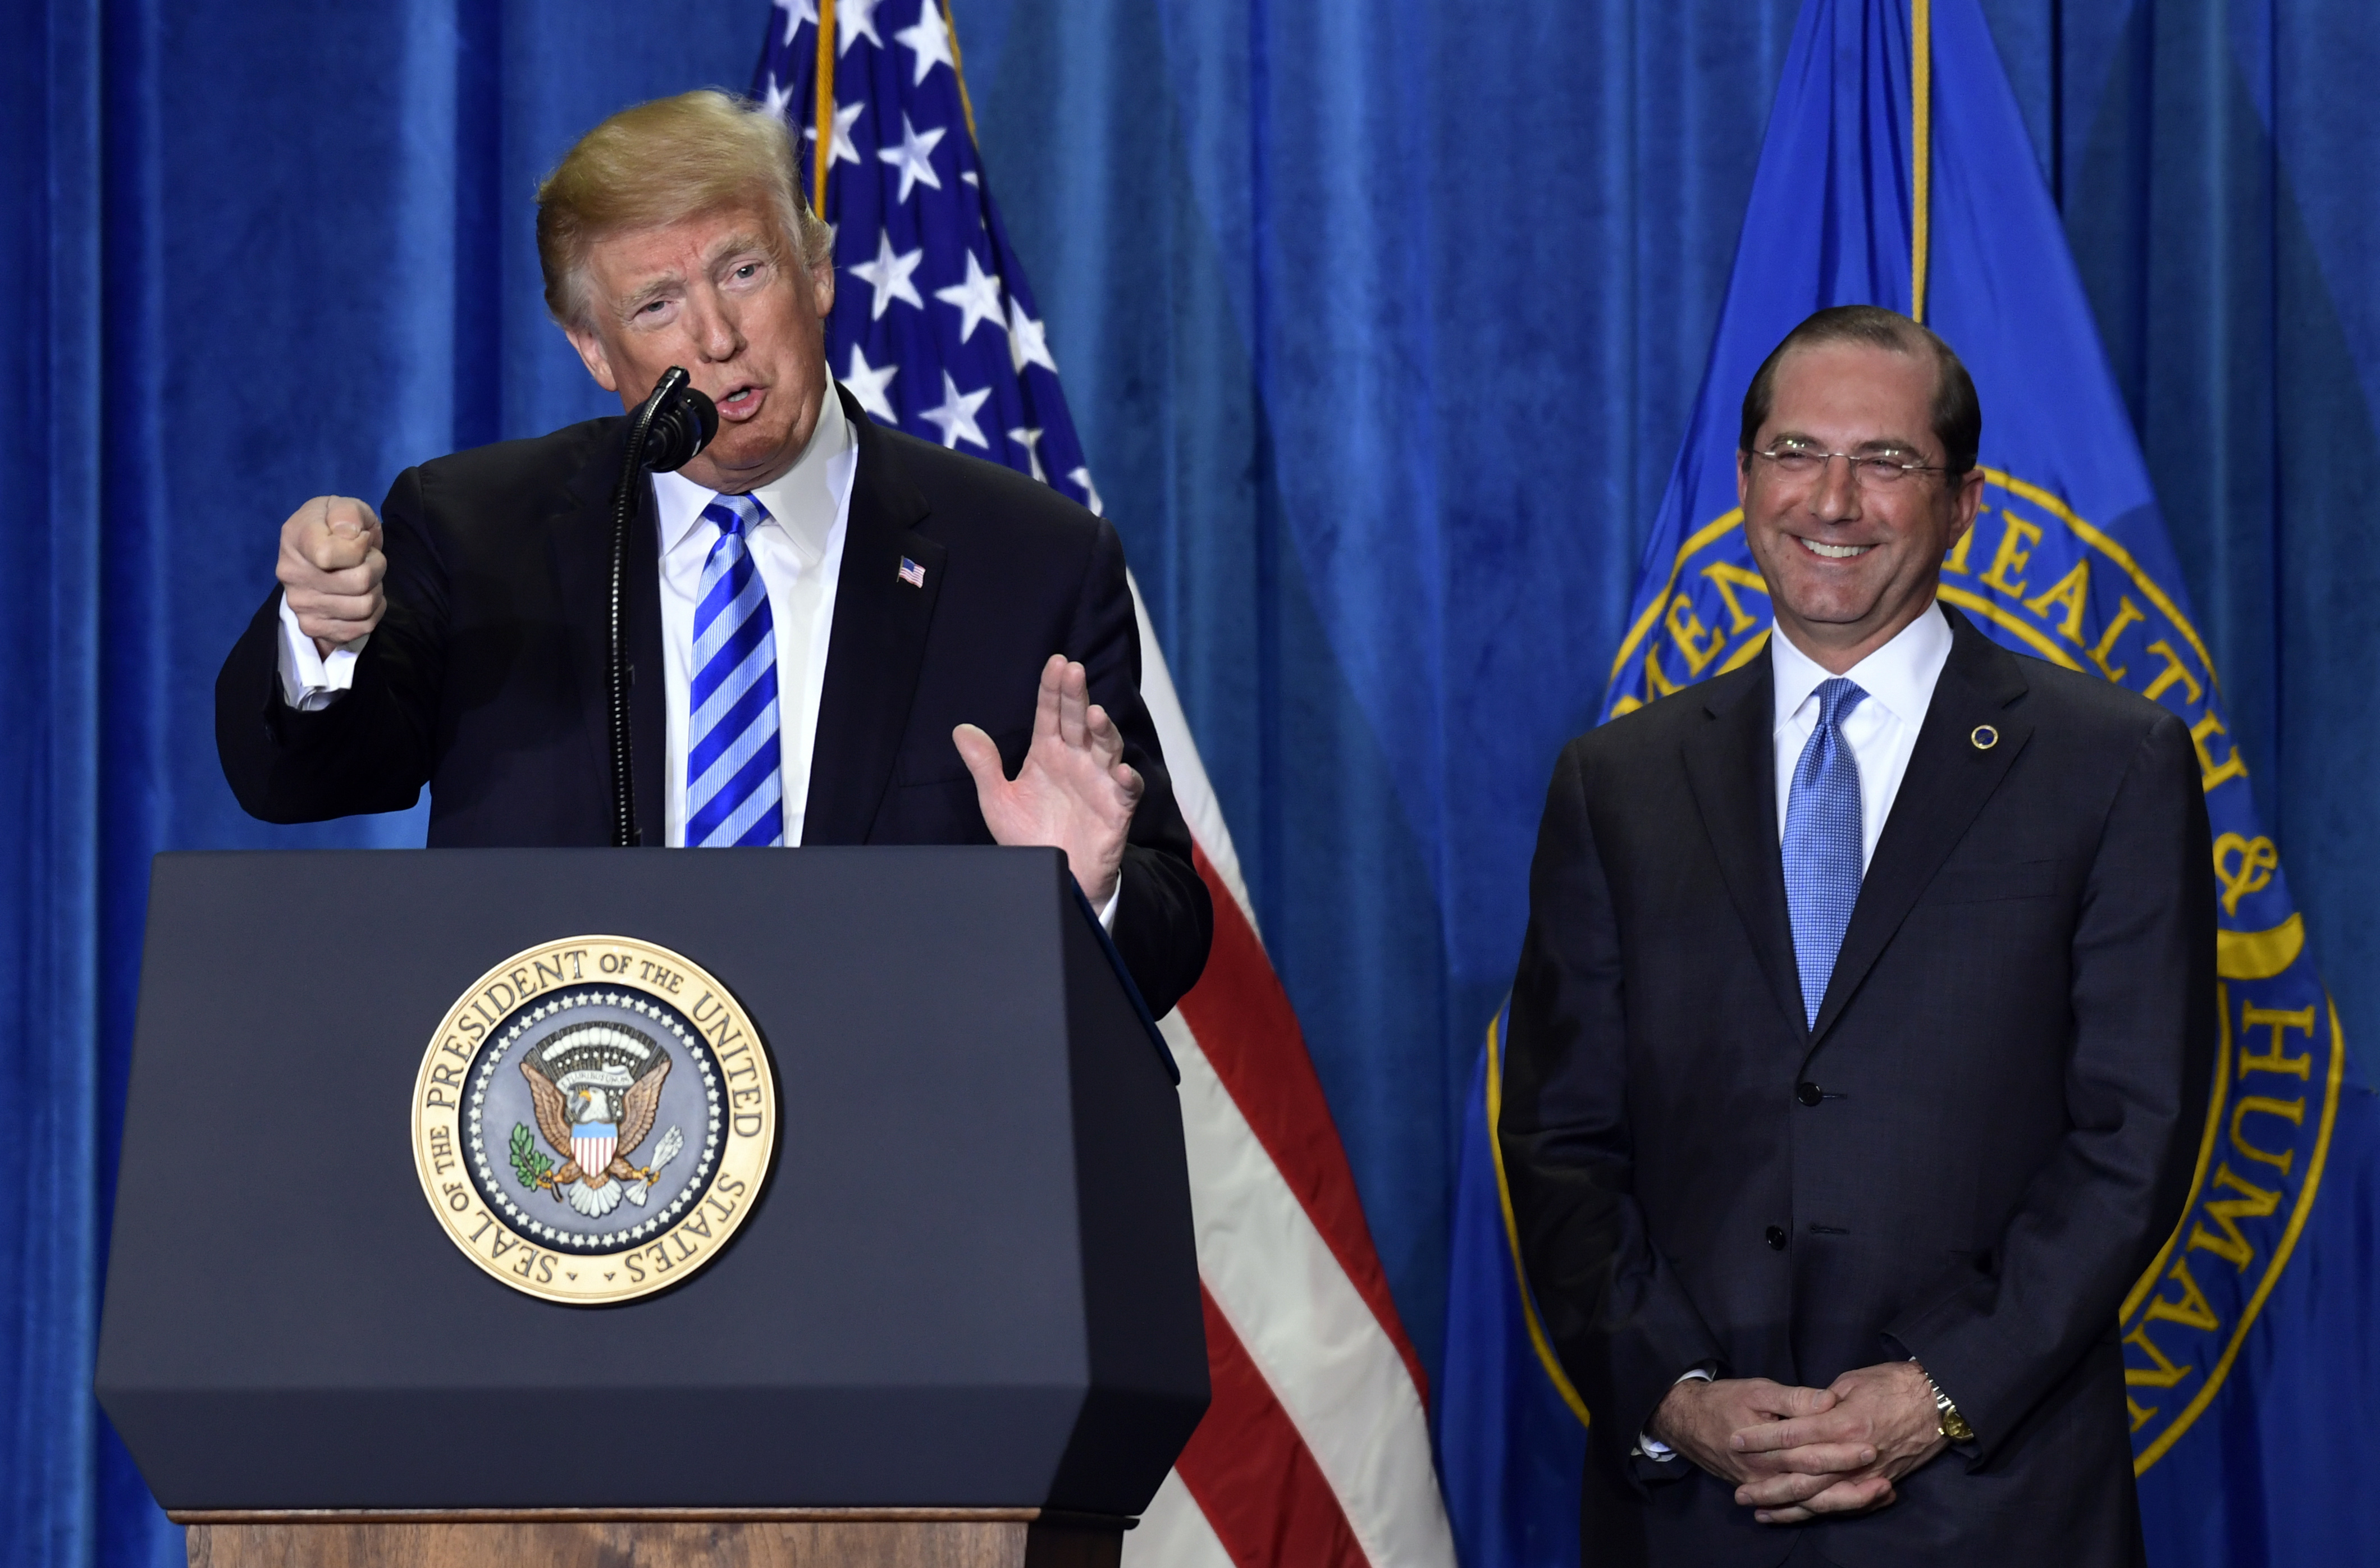 Alex Azar Hhs Secretary Donald Trump S Moves Are Ultimate Nightmare For Big Pharma Washington Times